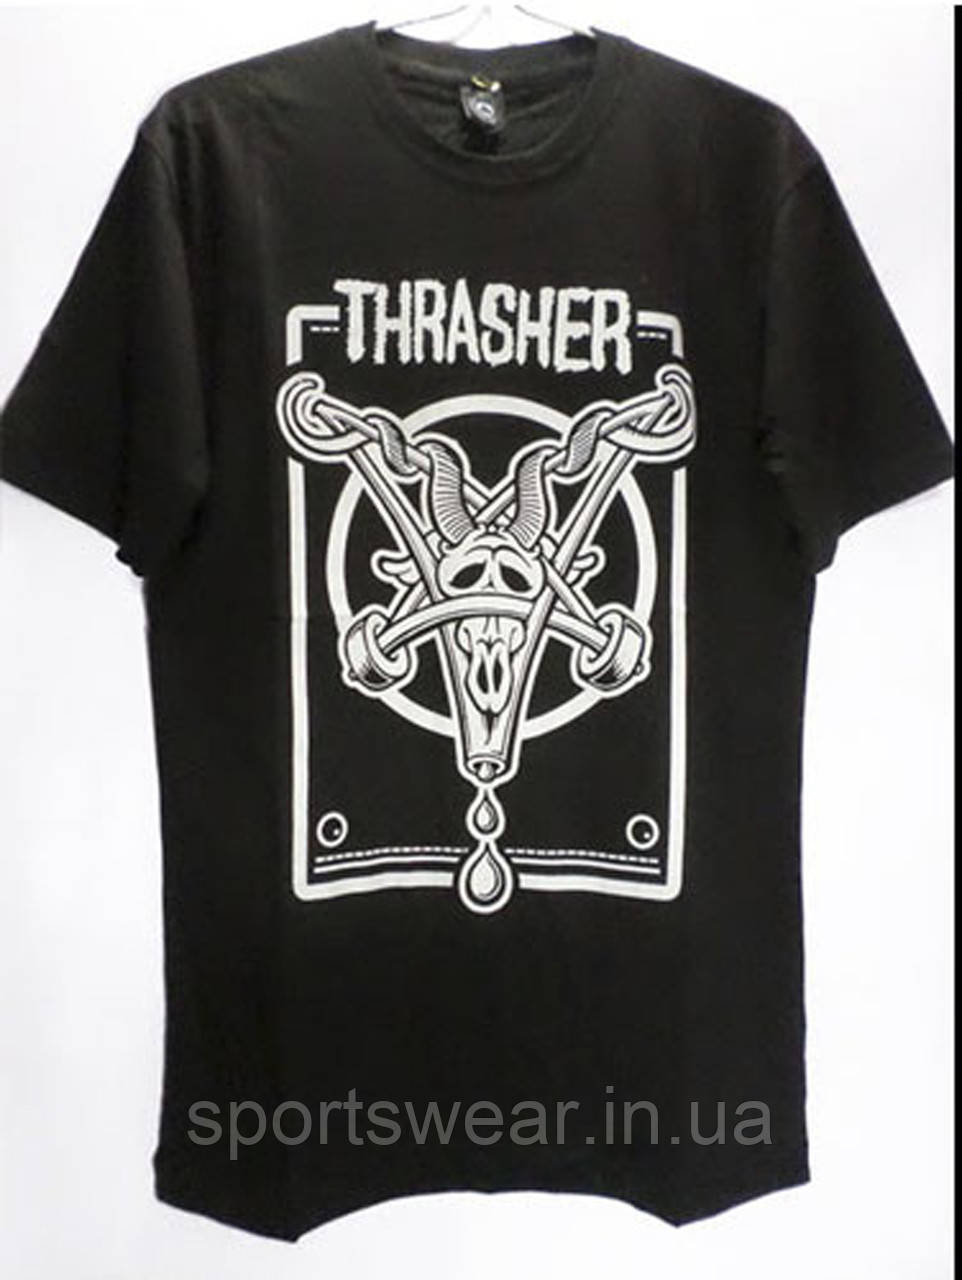 Футболка мужская Thrasher logo | Трешер Футболка